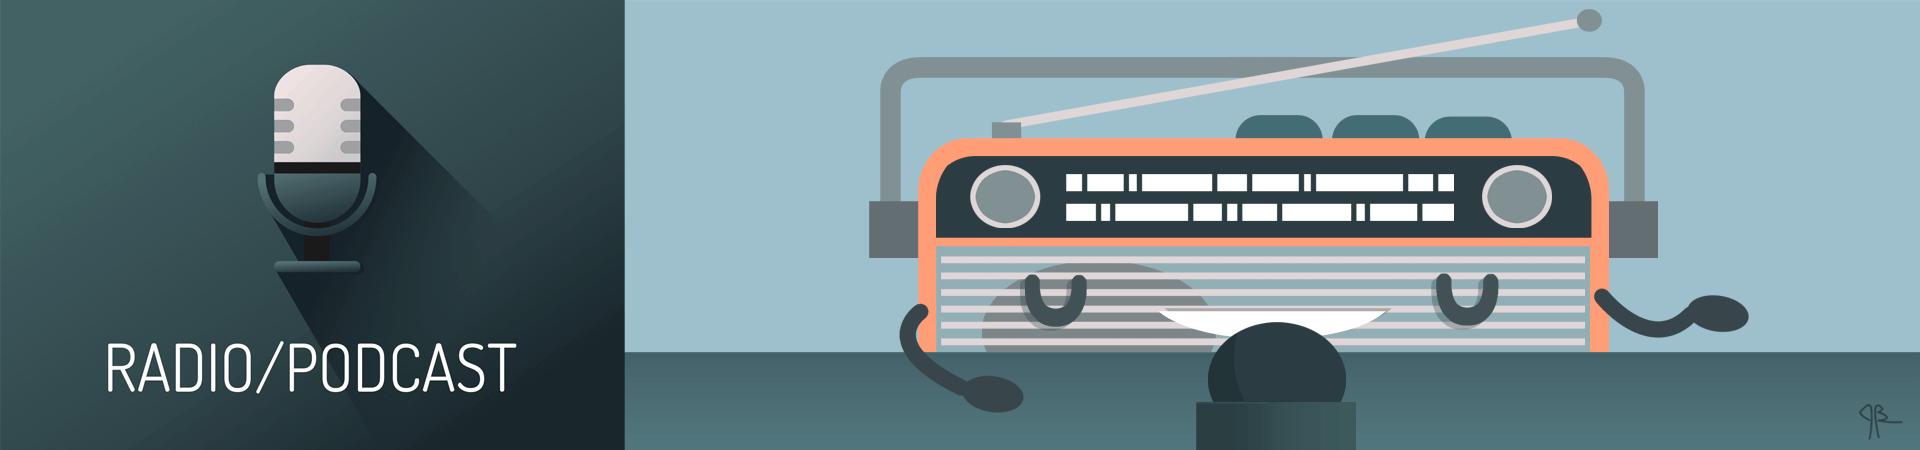 header-categoria-radio-podcast